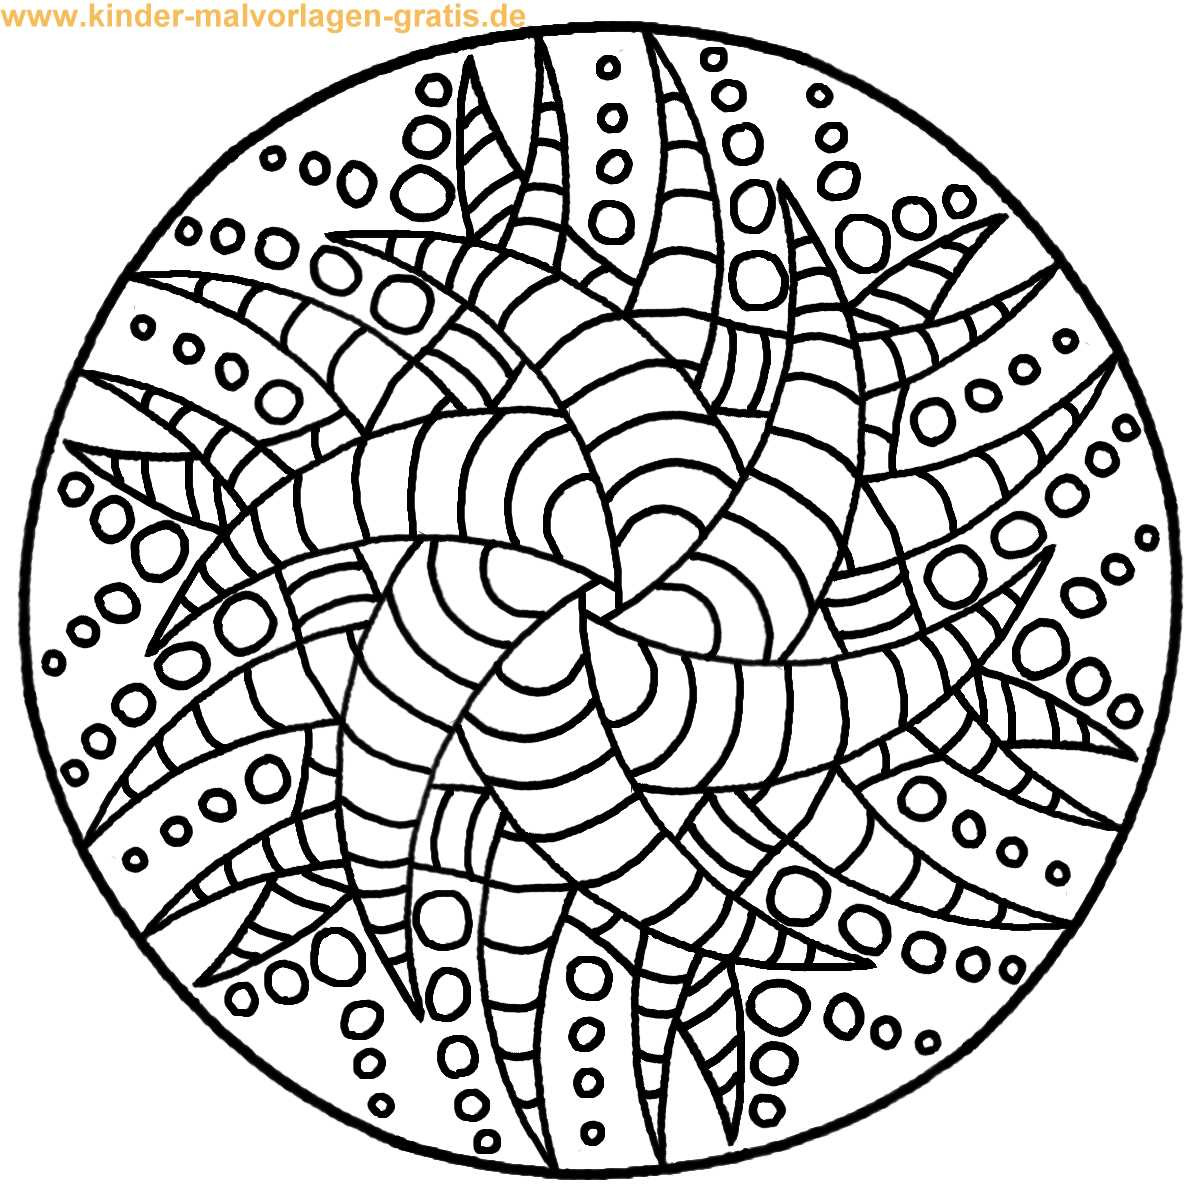 Malvorlagen Mandala  Mandala malvorlagen kostenlos zum ausdrucken